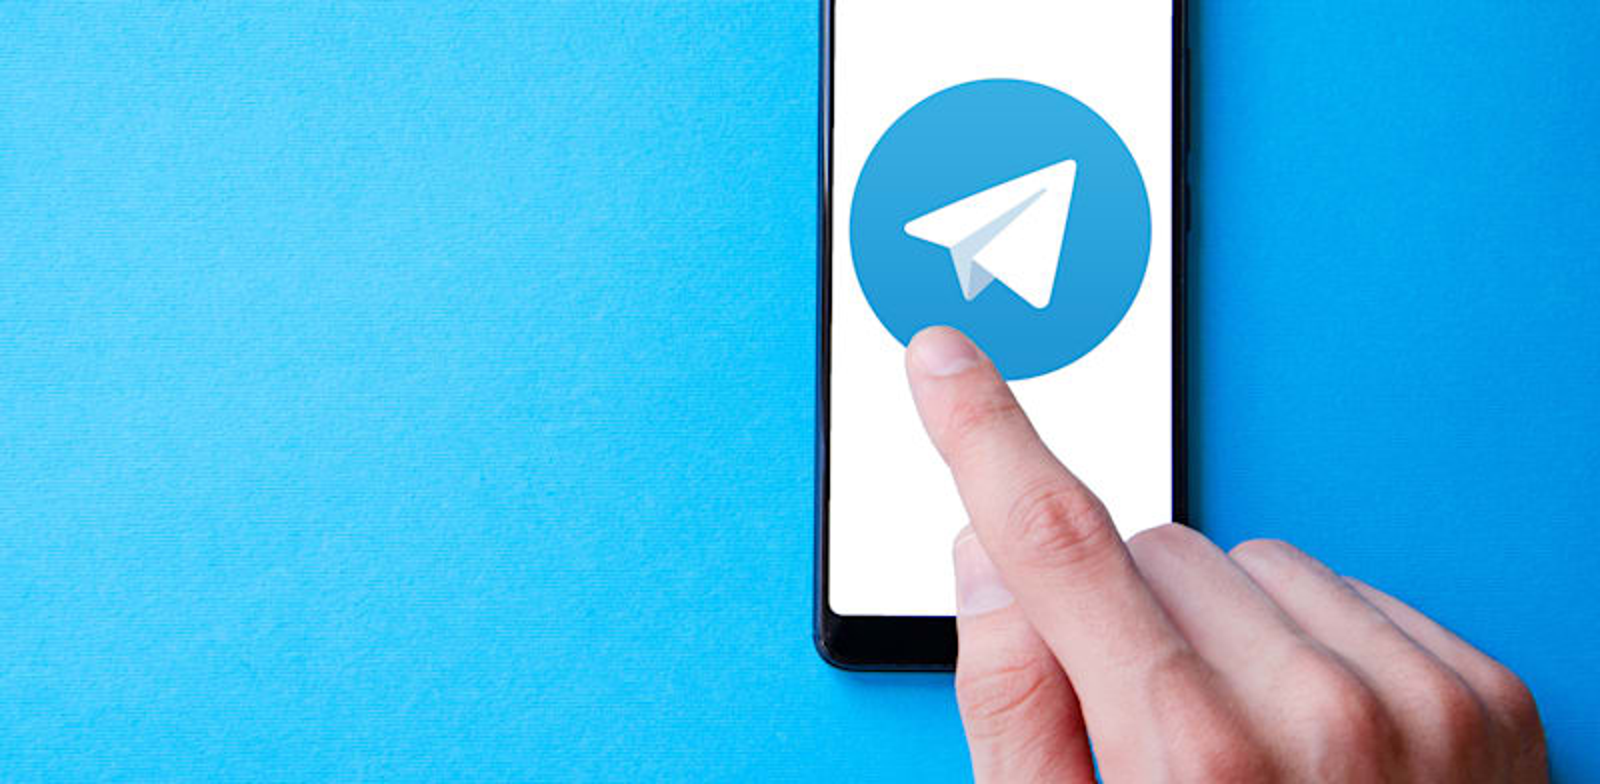 Telegram Photo: Arthus Shevtsov Shutterstock